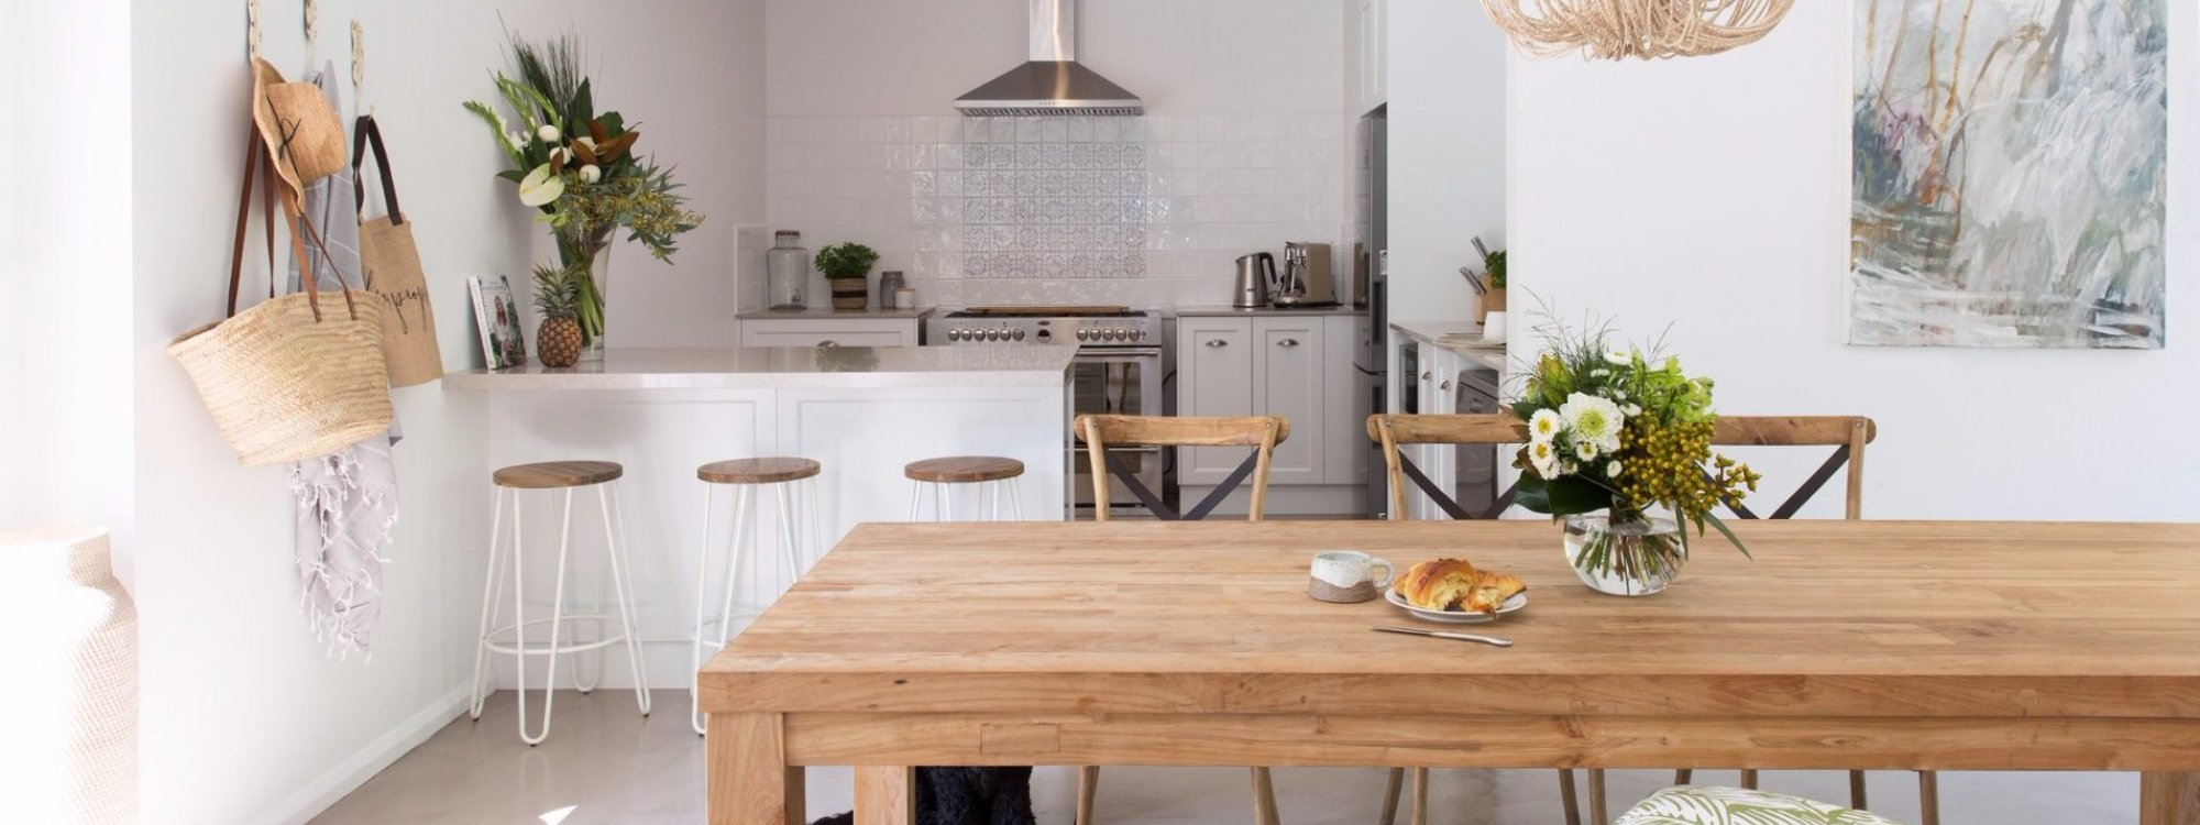 Satara - dining back to kitchen